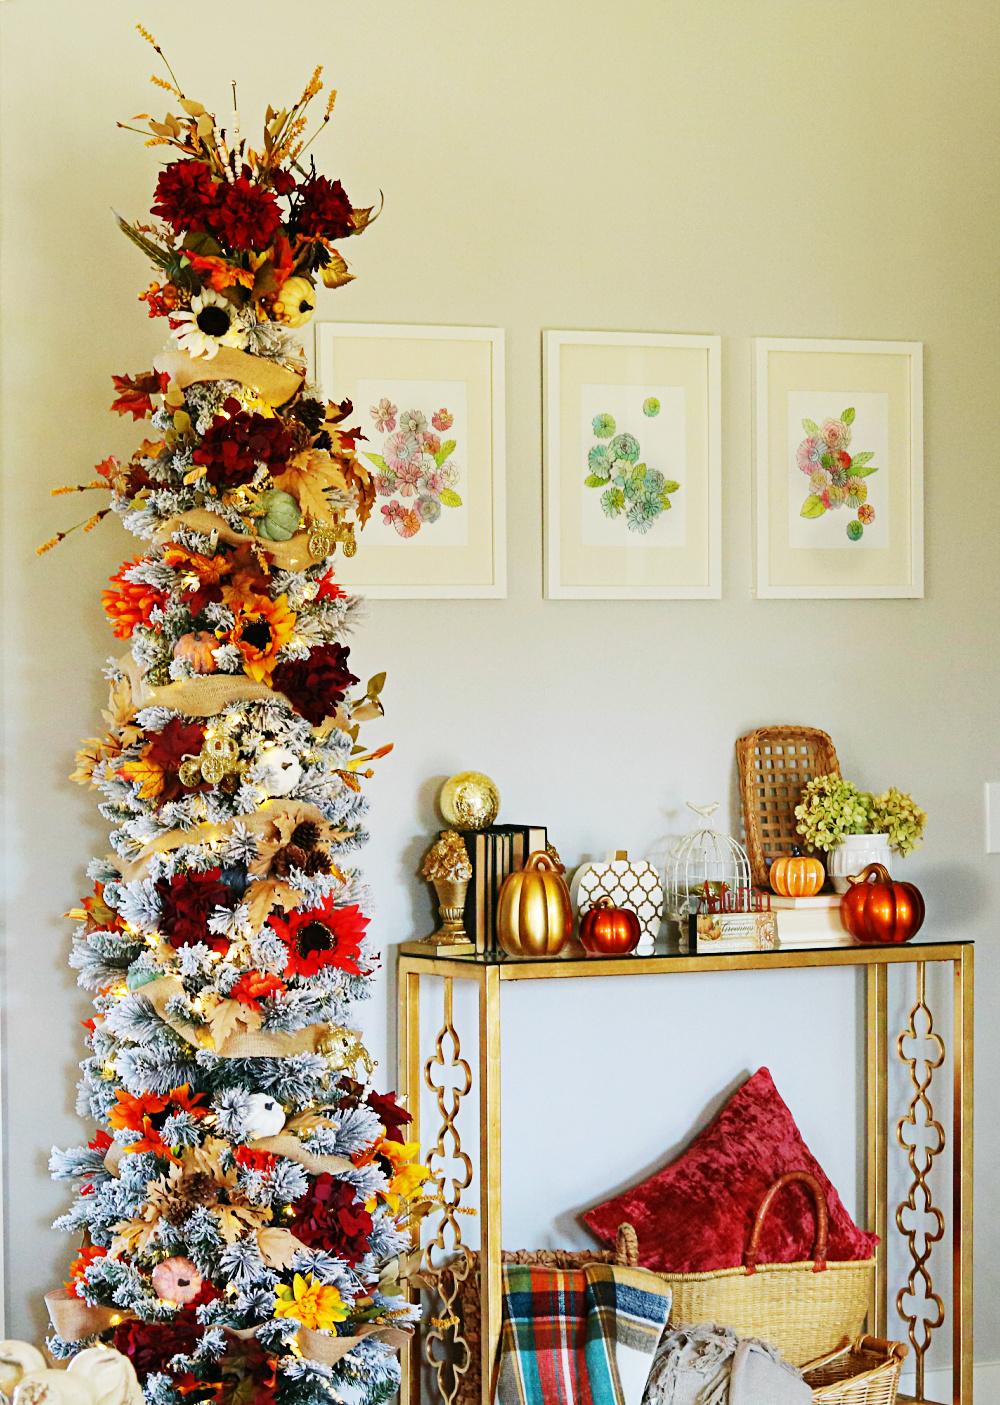 fall-harvest-decorating-tree-sunnydell-decorating-decor-homemaking